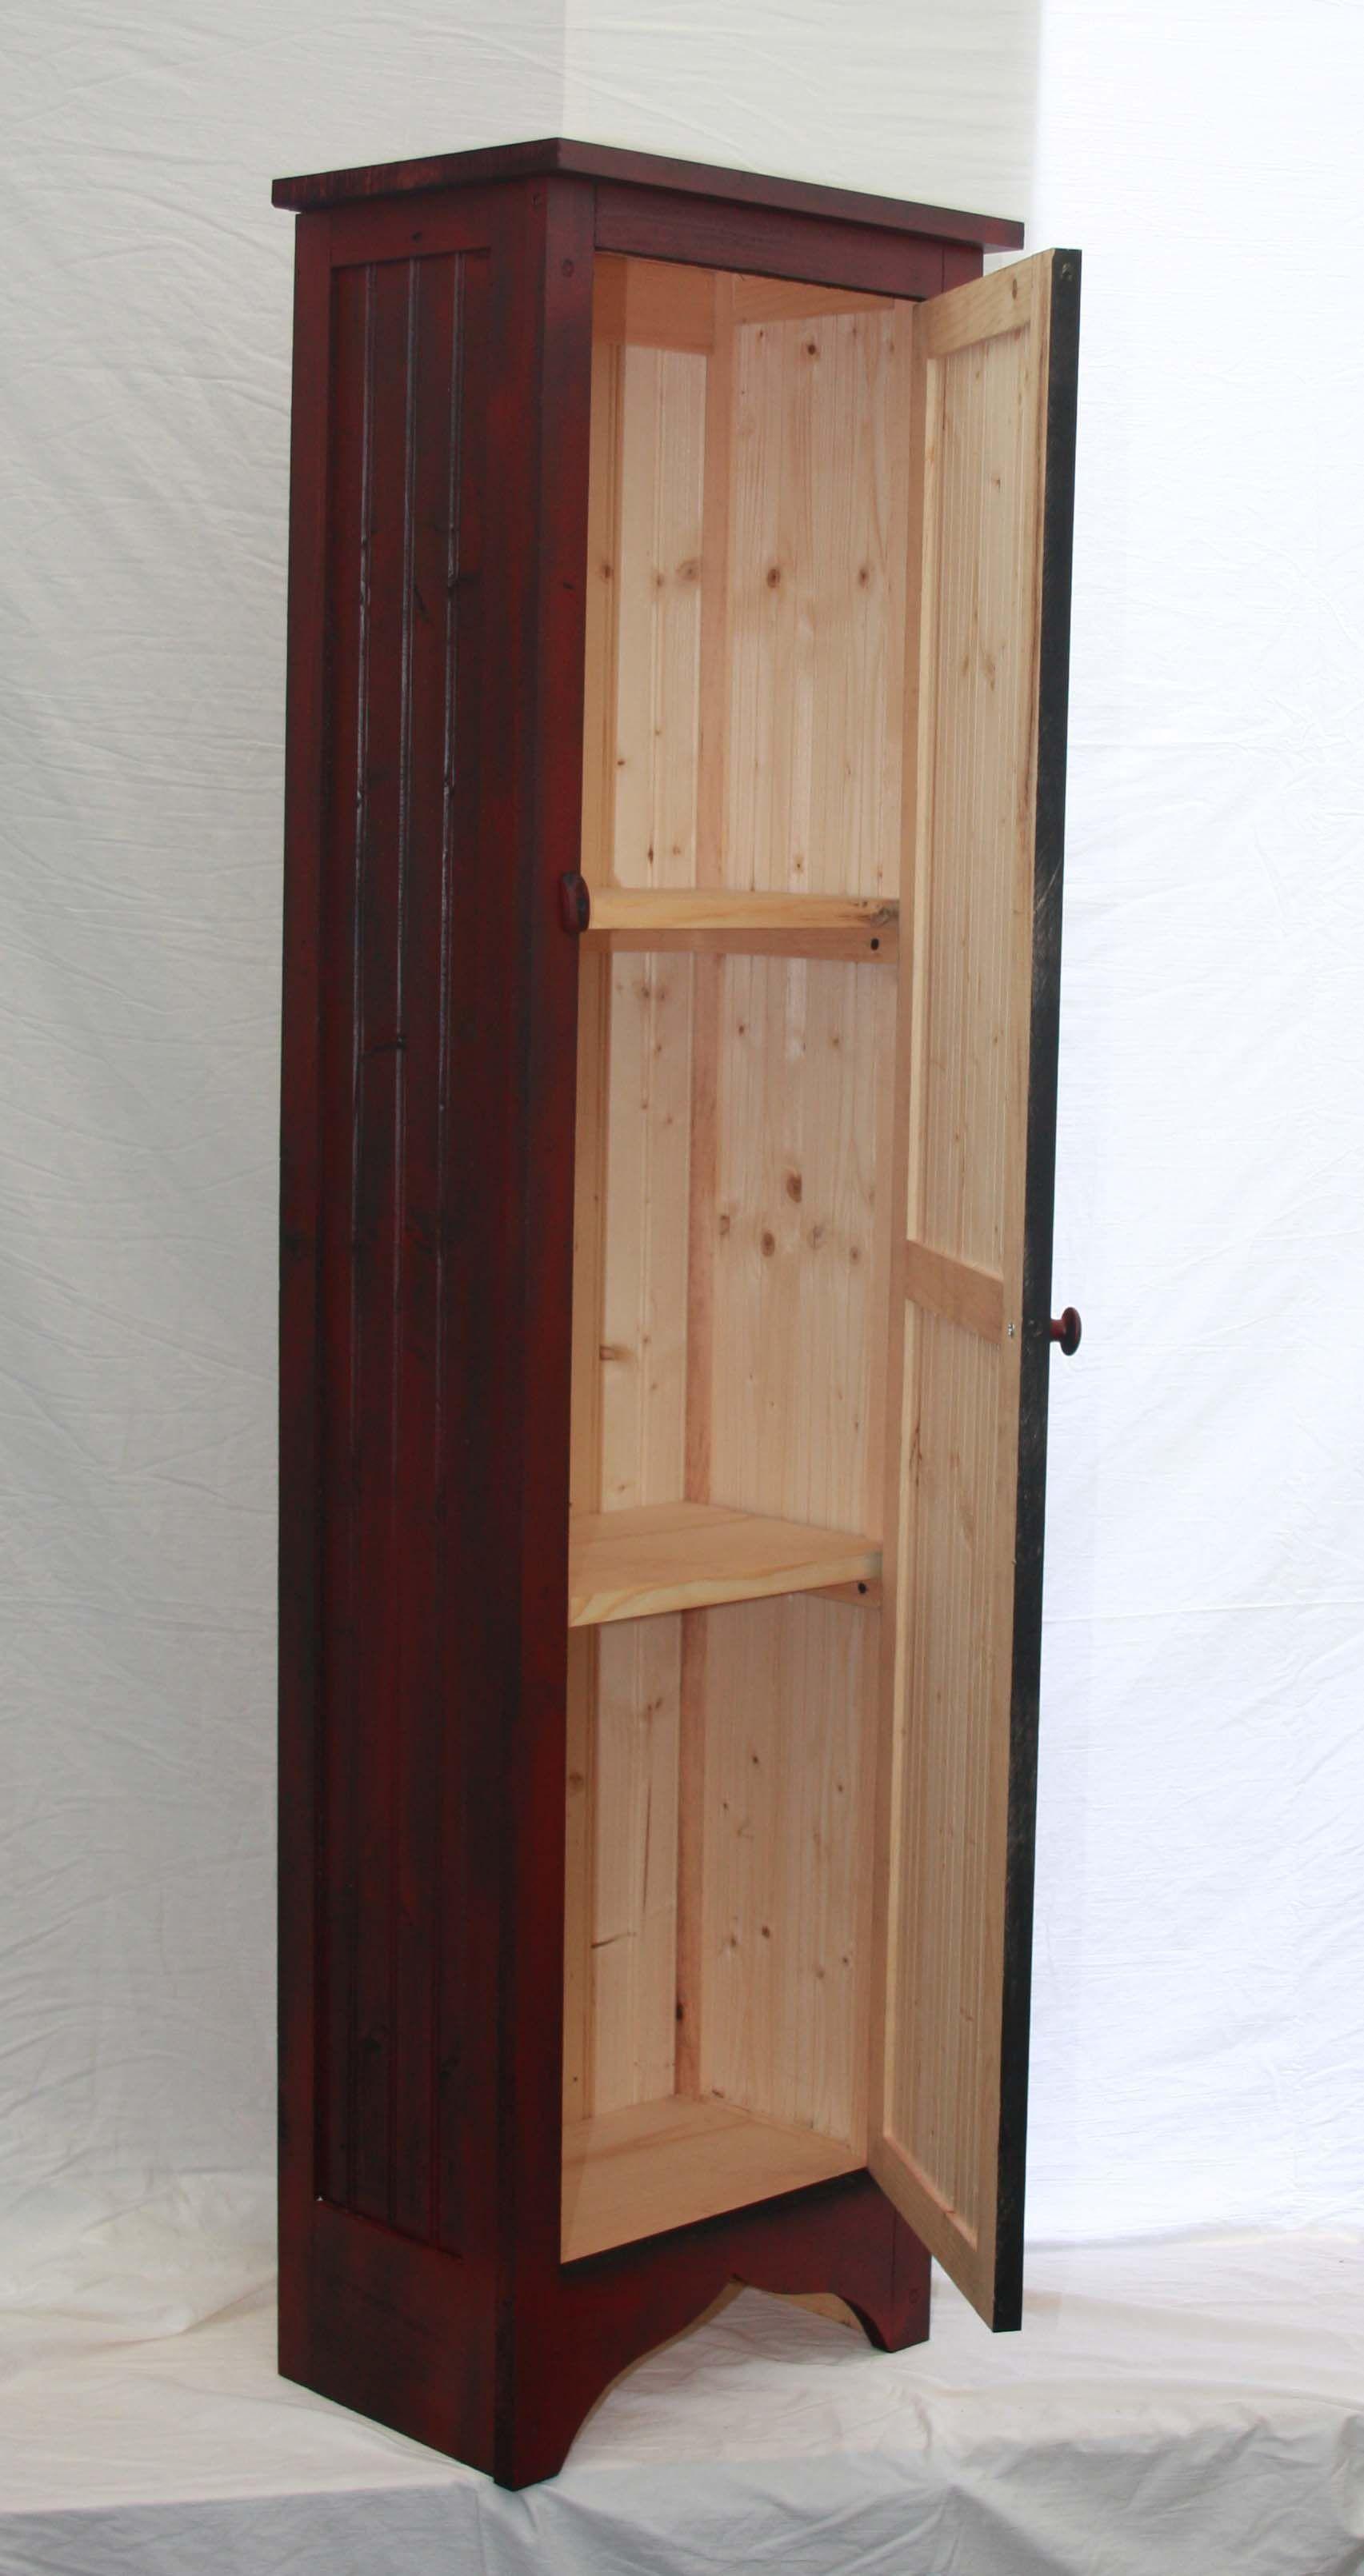 Jelly Cabinet Kitchen Furniture Storage Jelly Cupboard Wood